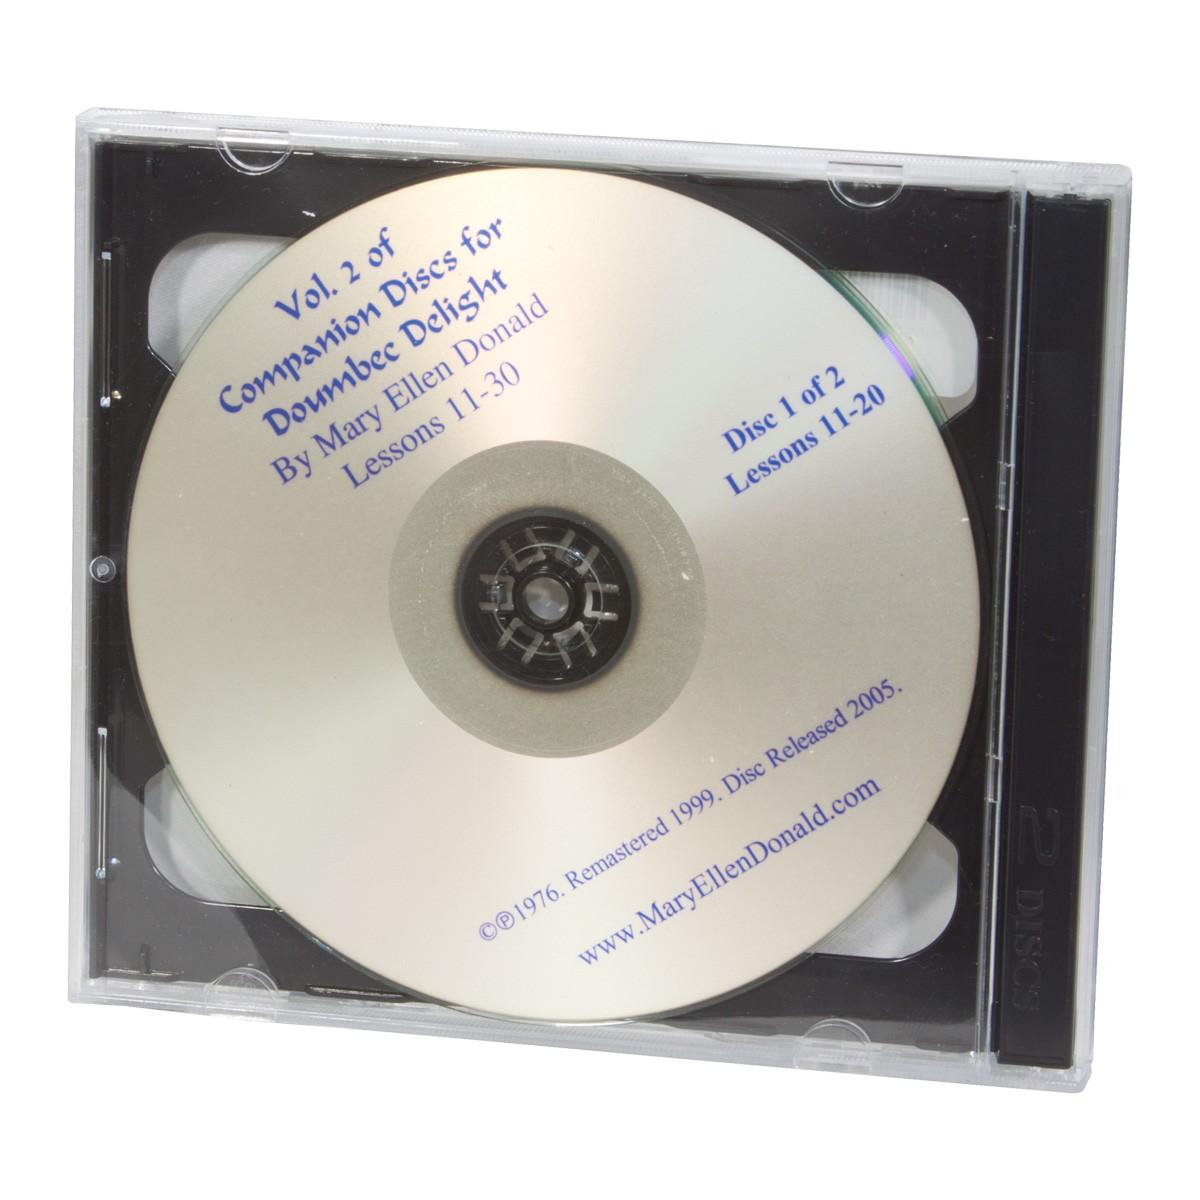 Doumbek Delight CD Volume 2 by Mary Ellen Donald